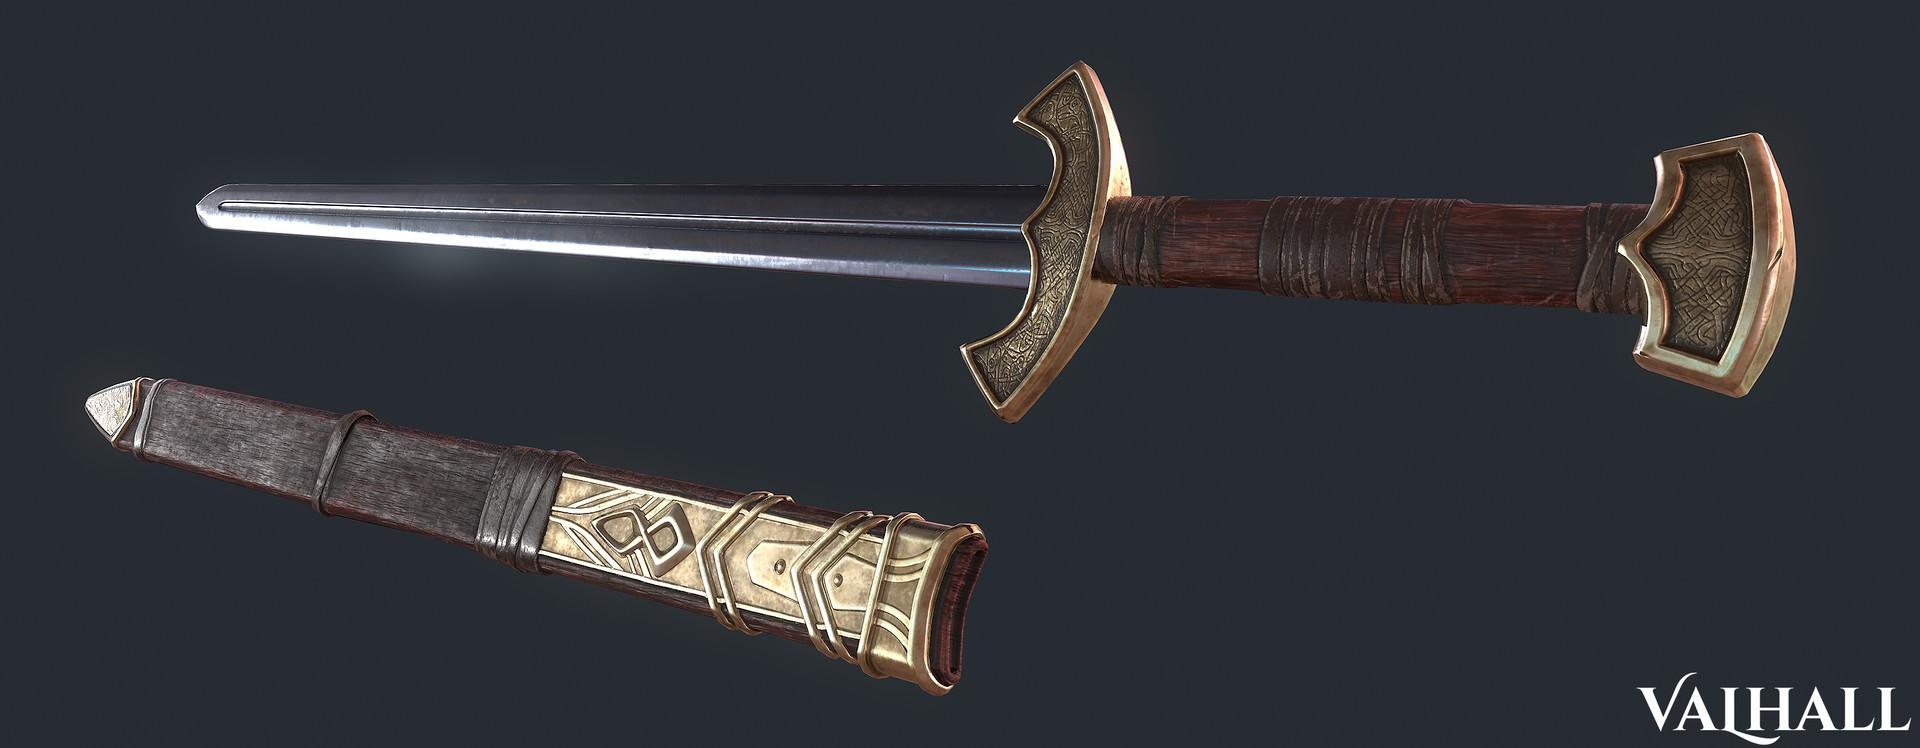 Roger perez sword01 sideback